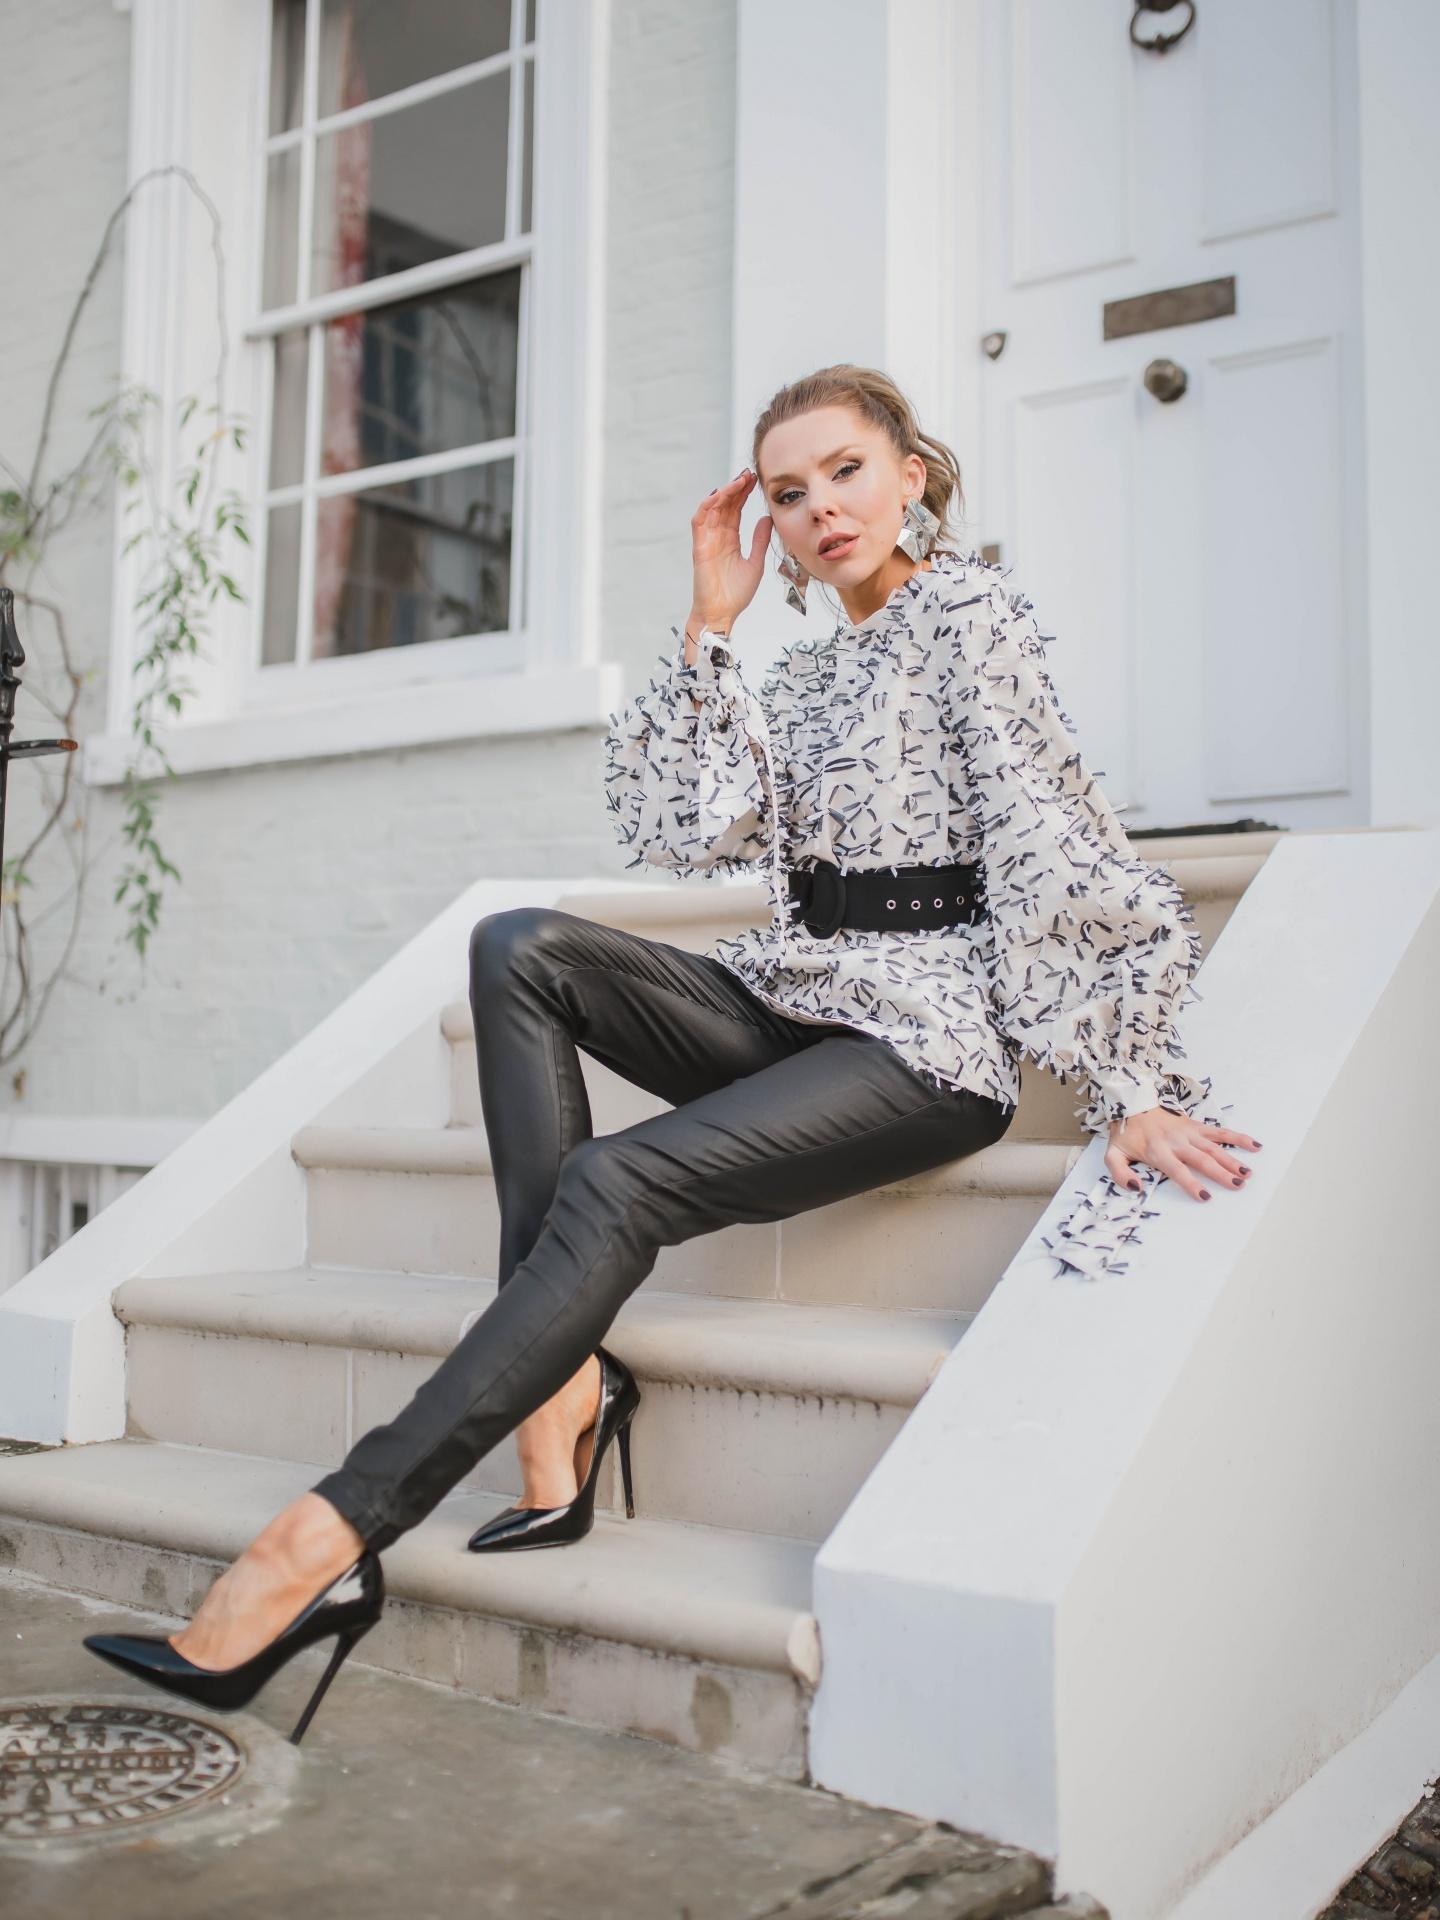 novo london, fashion, style, evening wear, designer, laura blair, london fashion girl